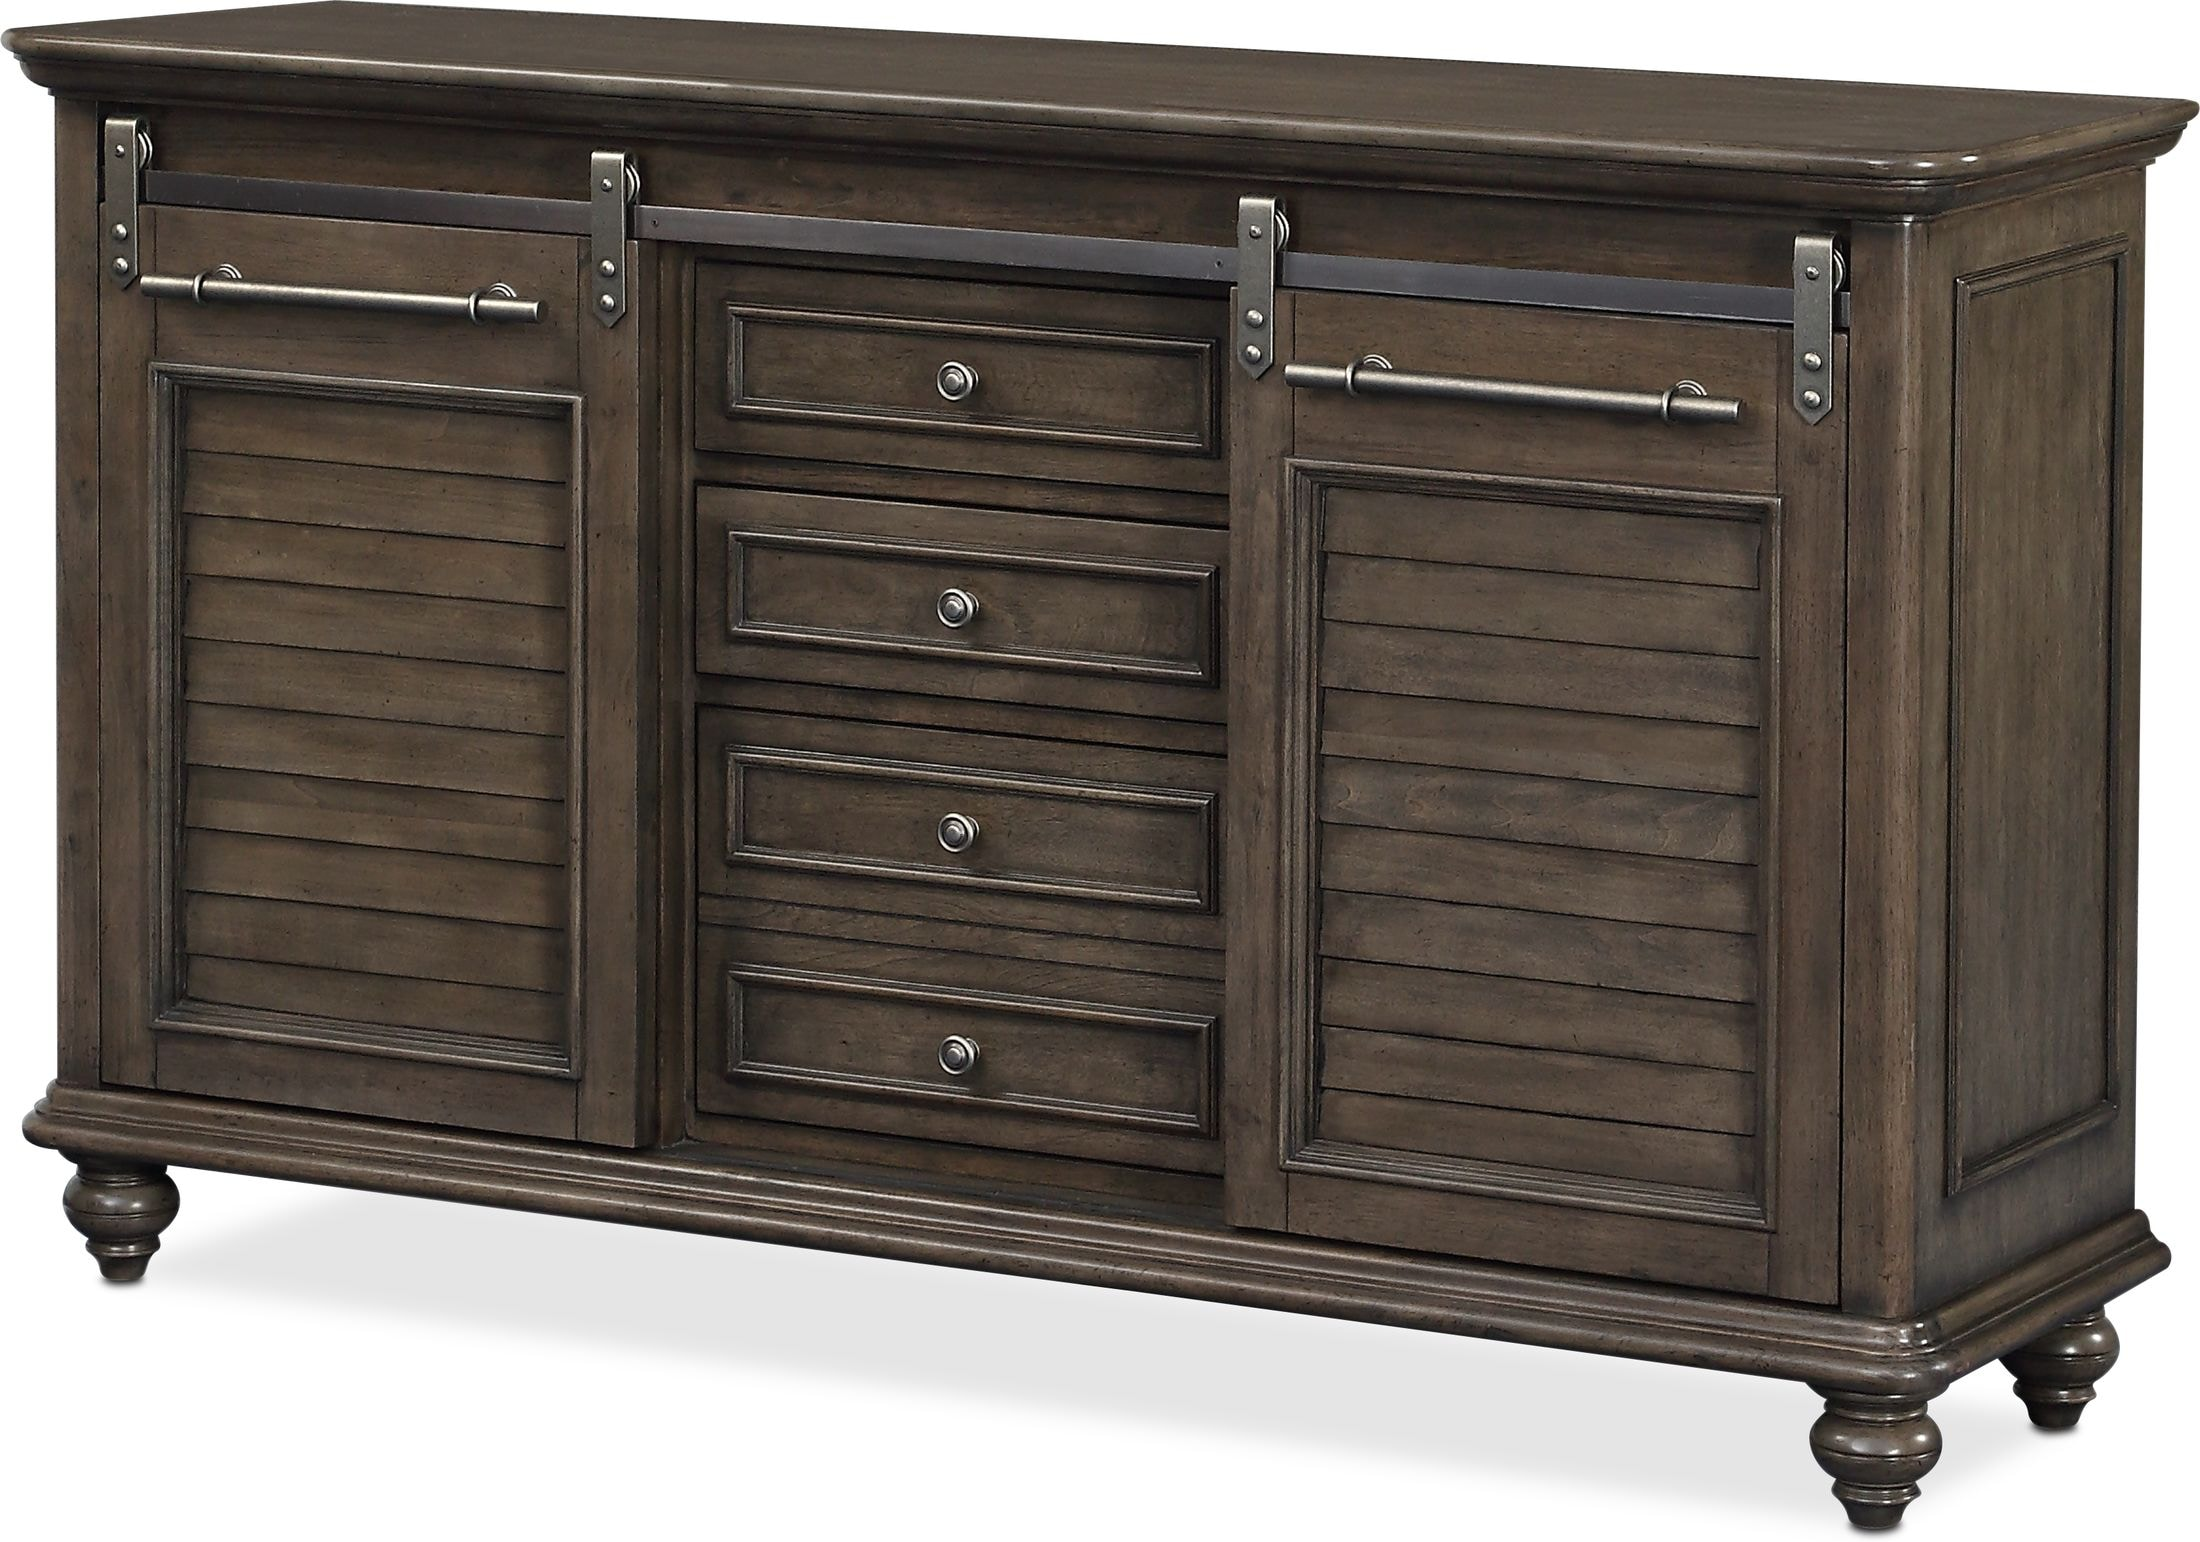 Dining Room Furniture - Charleston Buffet